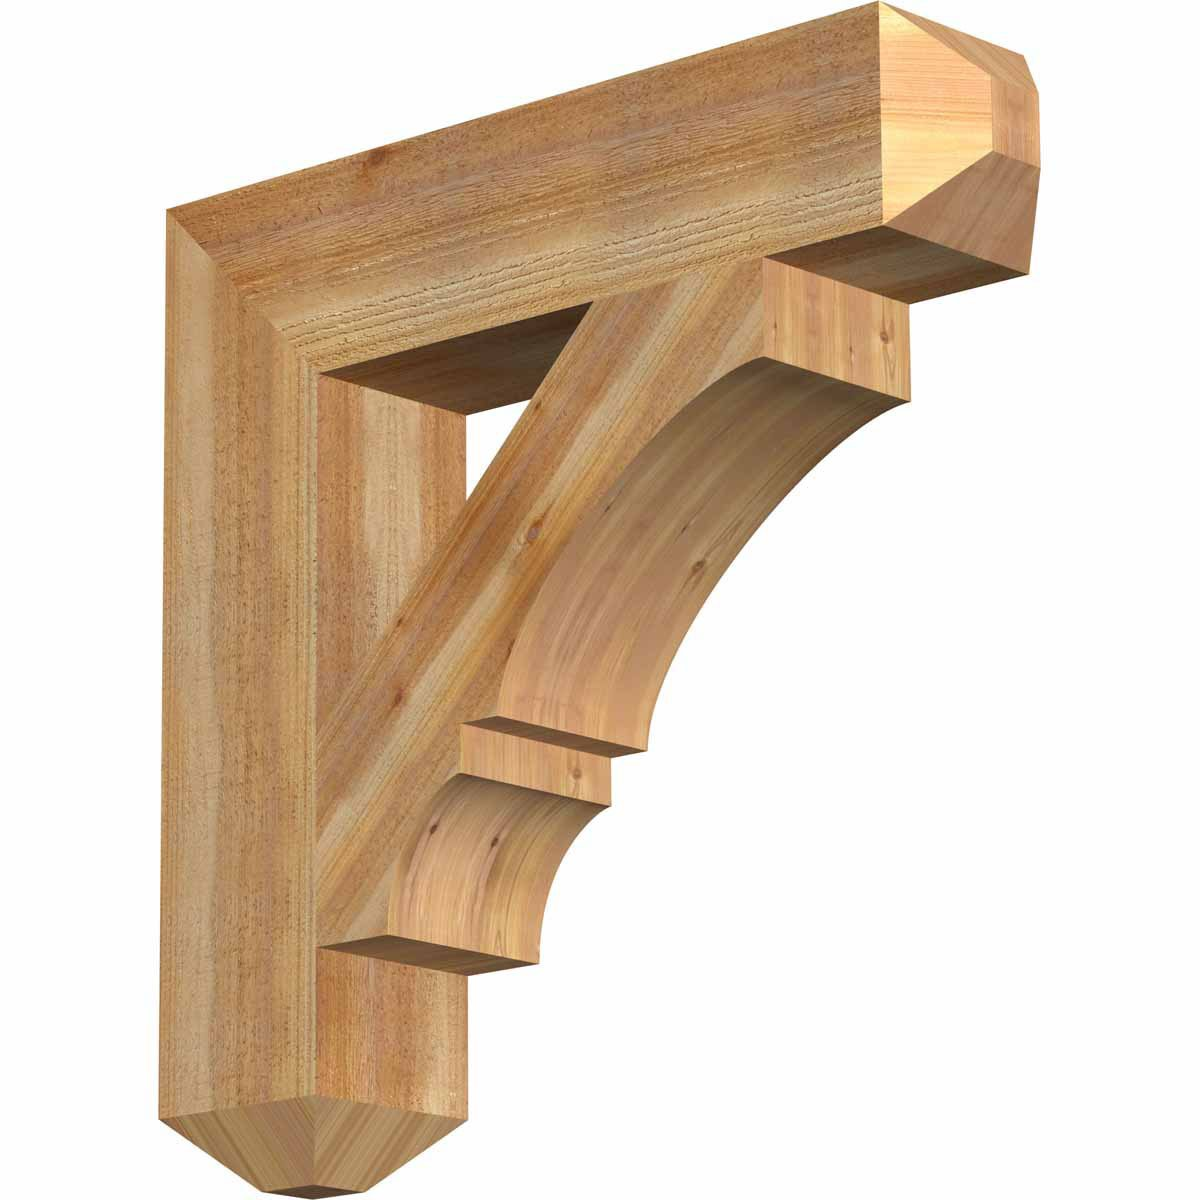 Amazon.com: Ekena Millwork BKT06X28X28BOA04RWR Balboa Craftsman Rough Sawn Bracket, 6